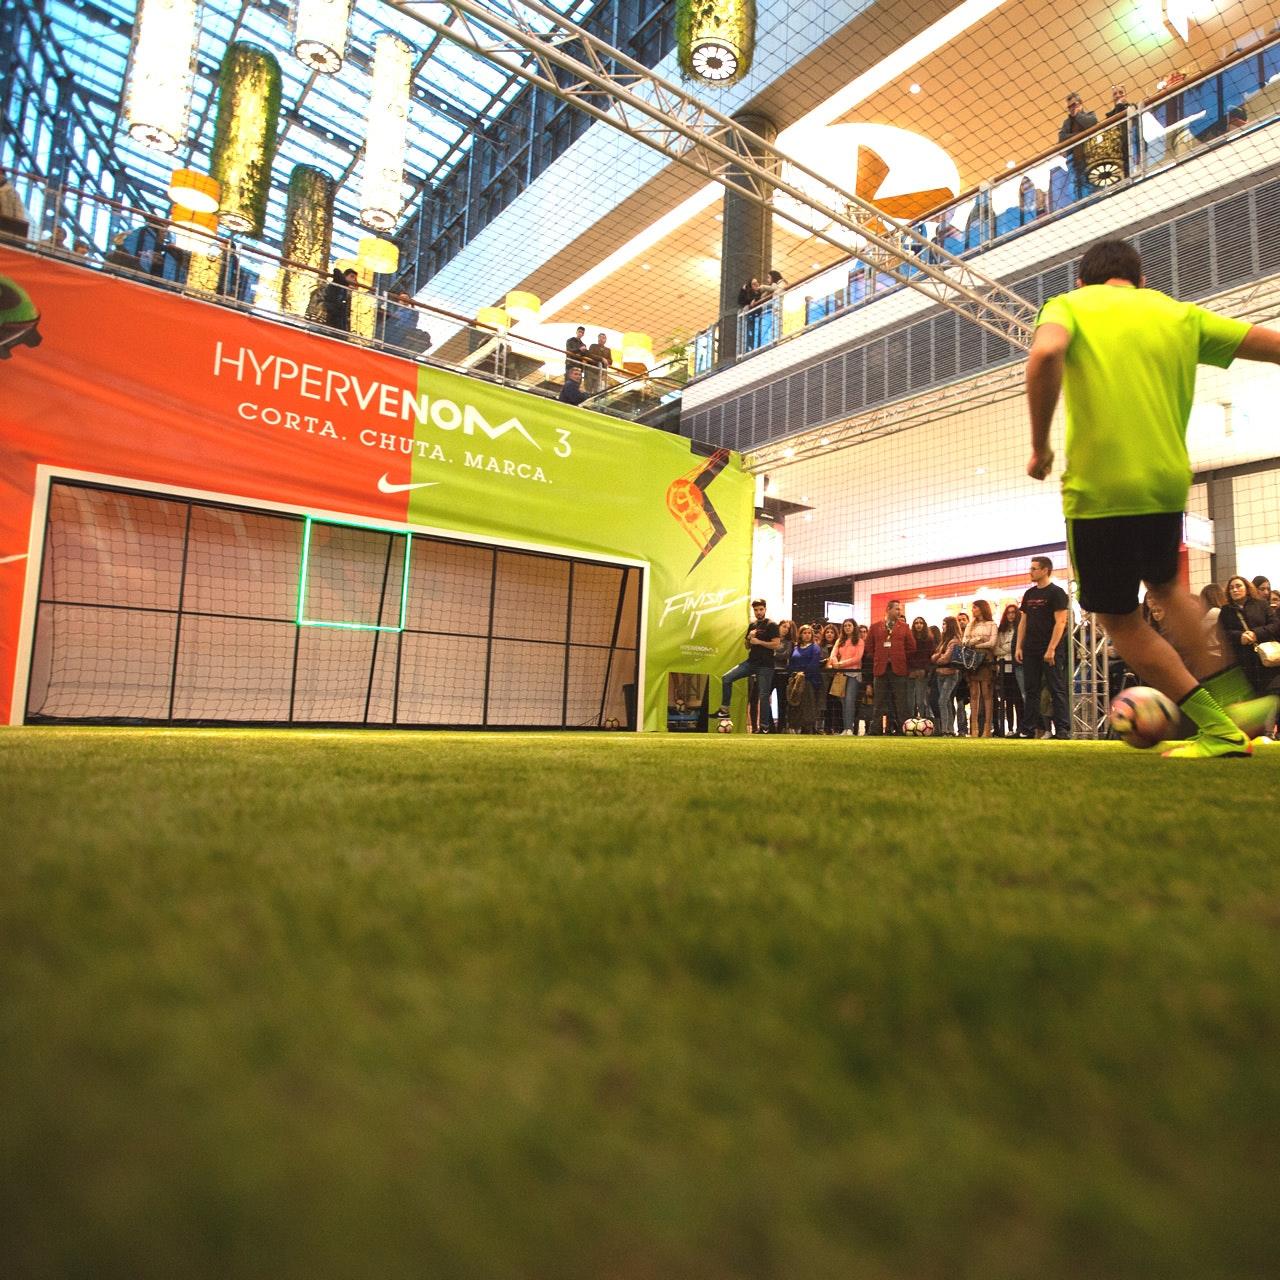 Testa as novas botas #Hypervenom da @NikeFootball